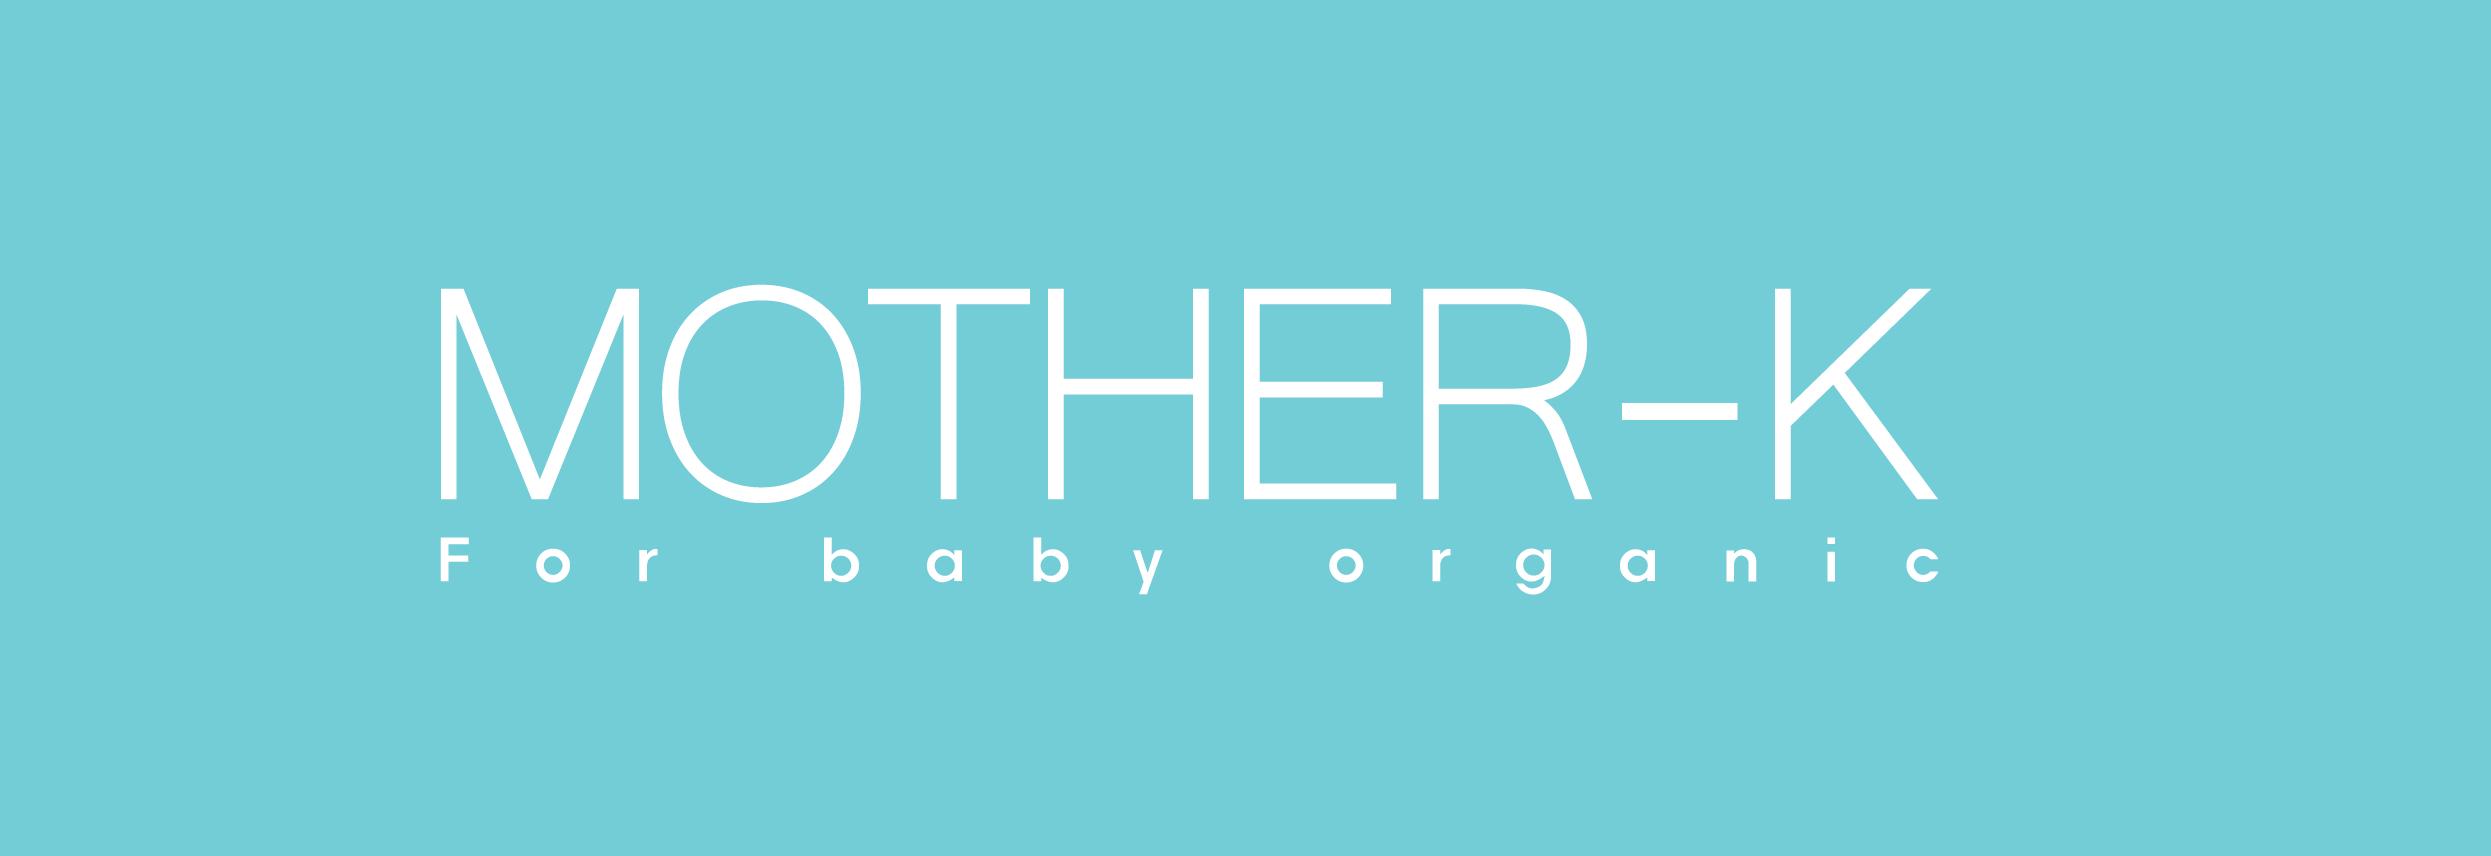 Mother K